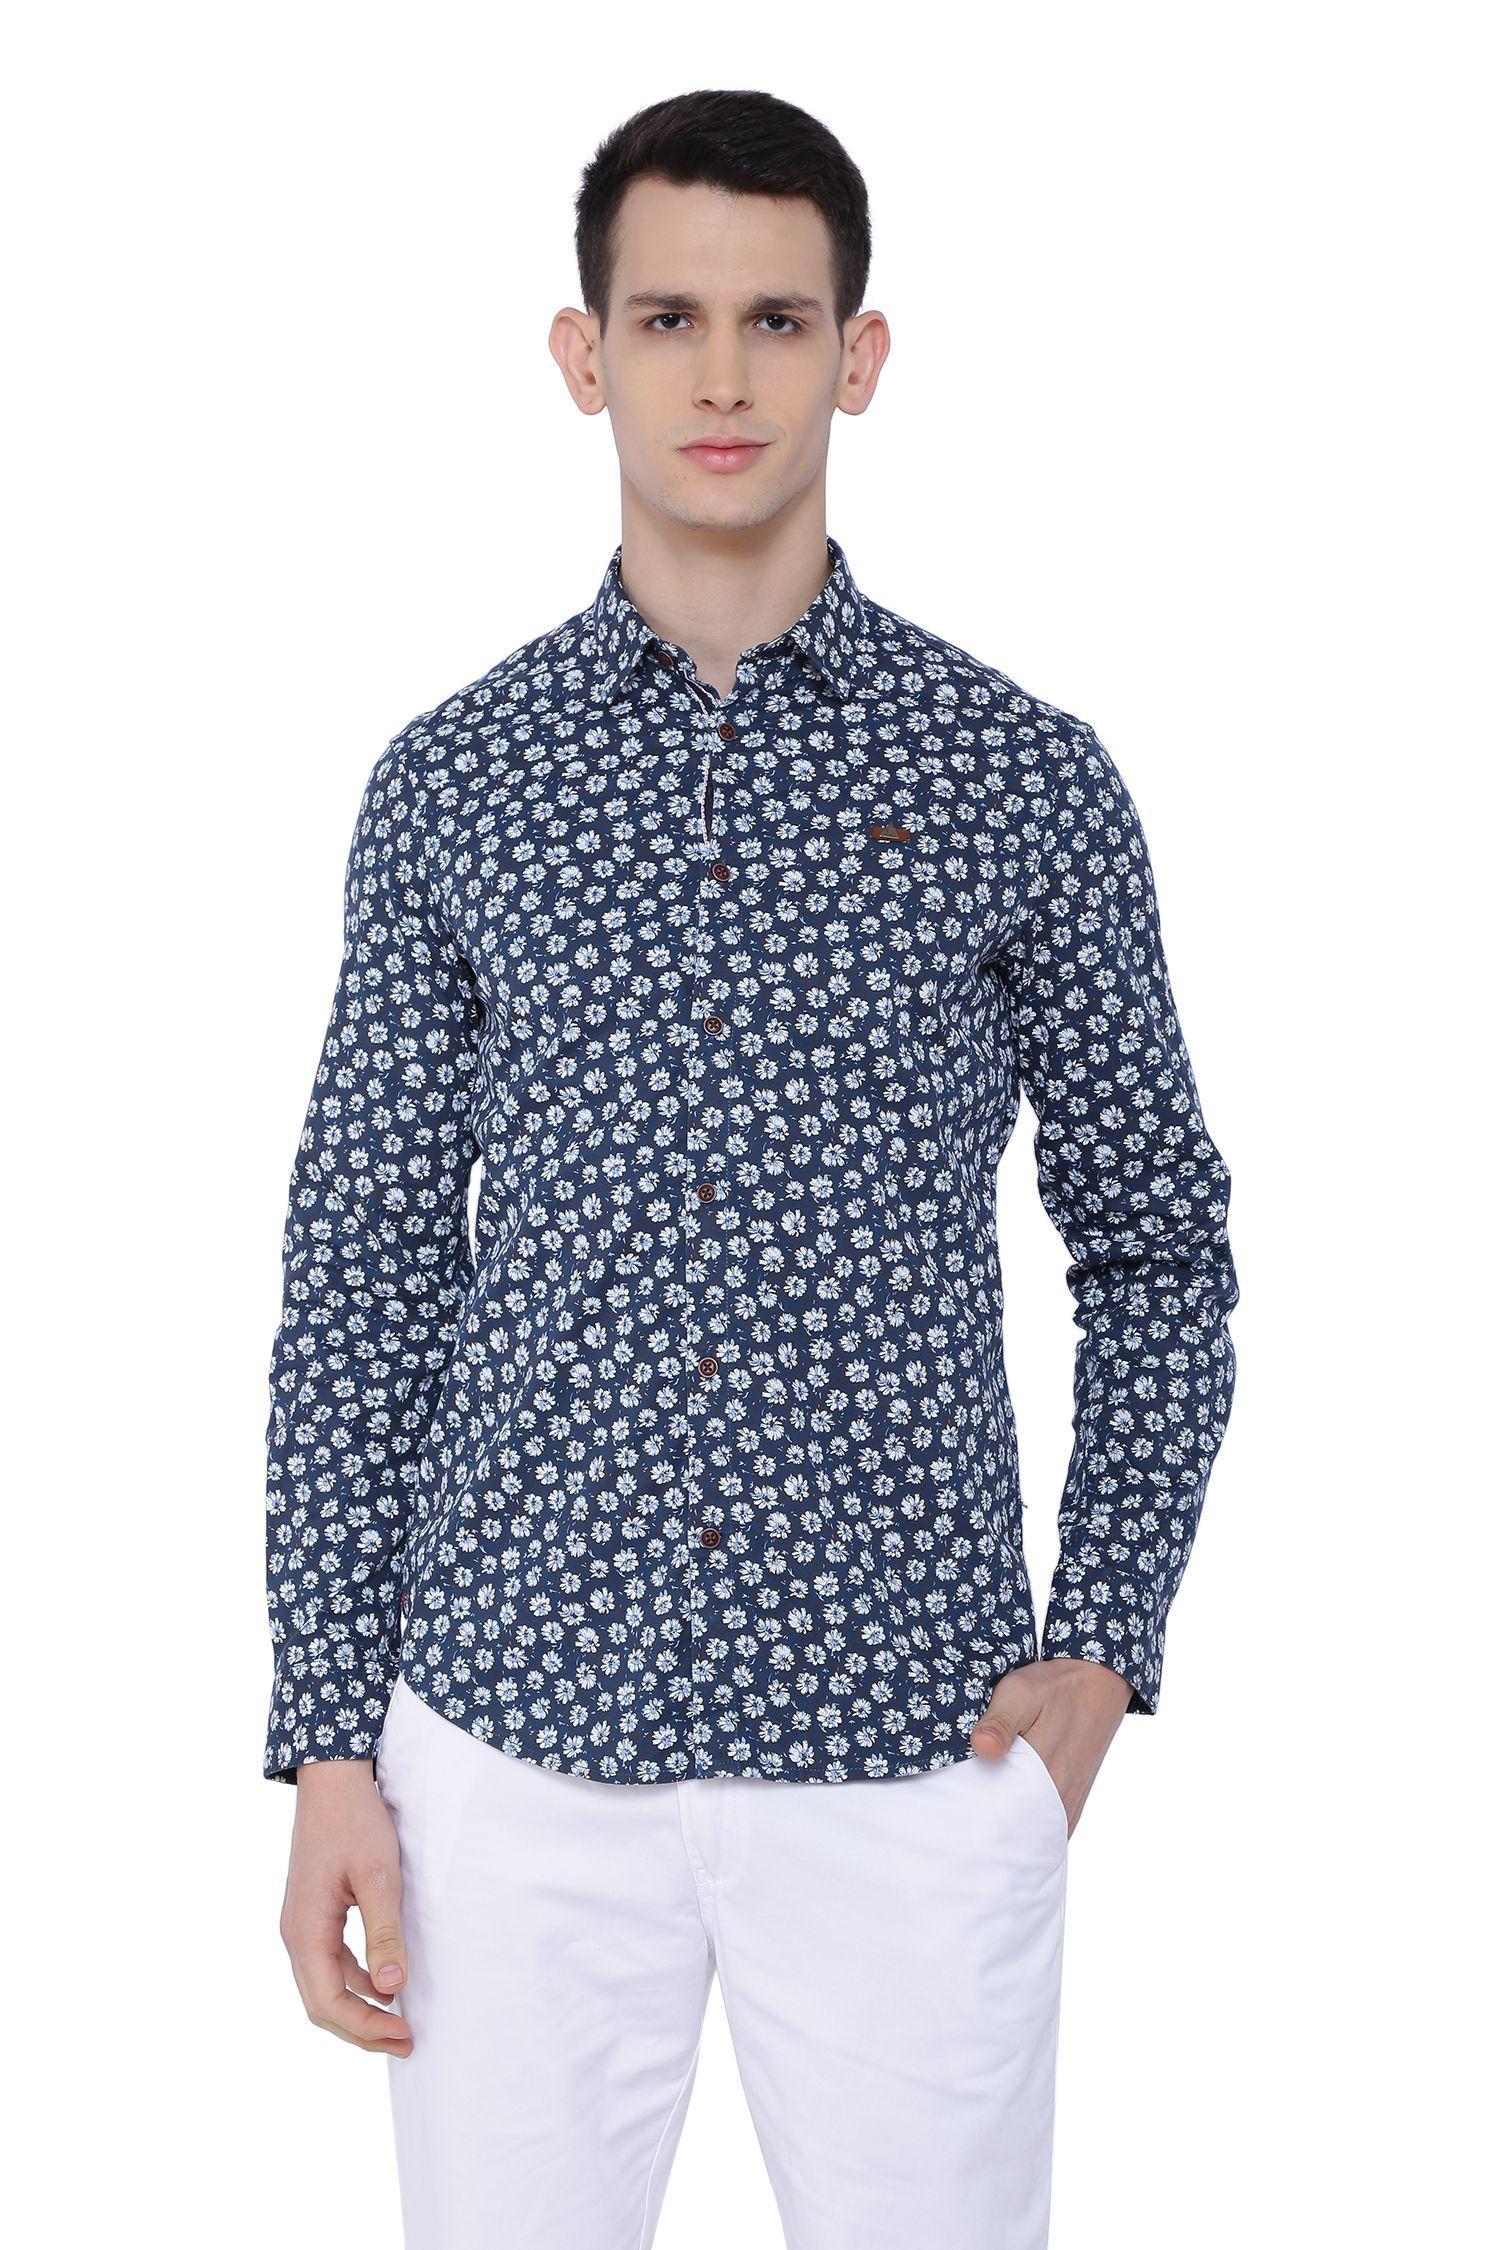 Risque 100 Percent Cotton Navy Prints Shirt